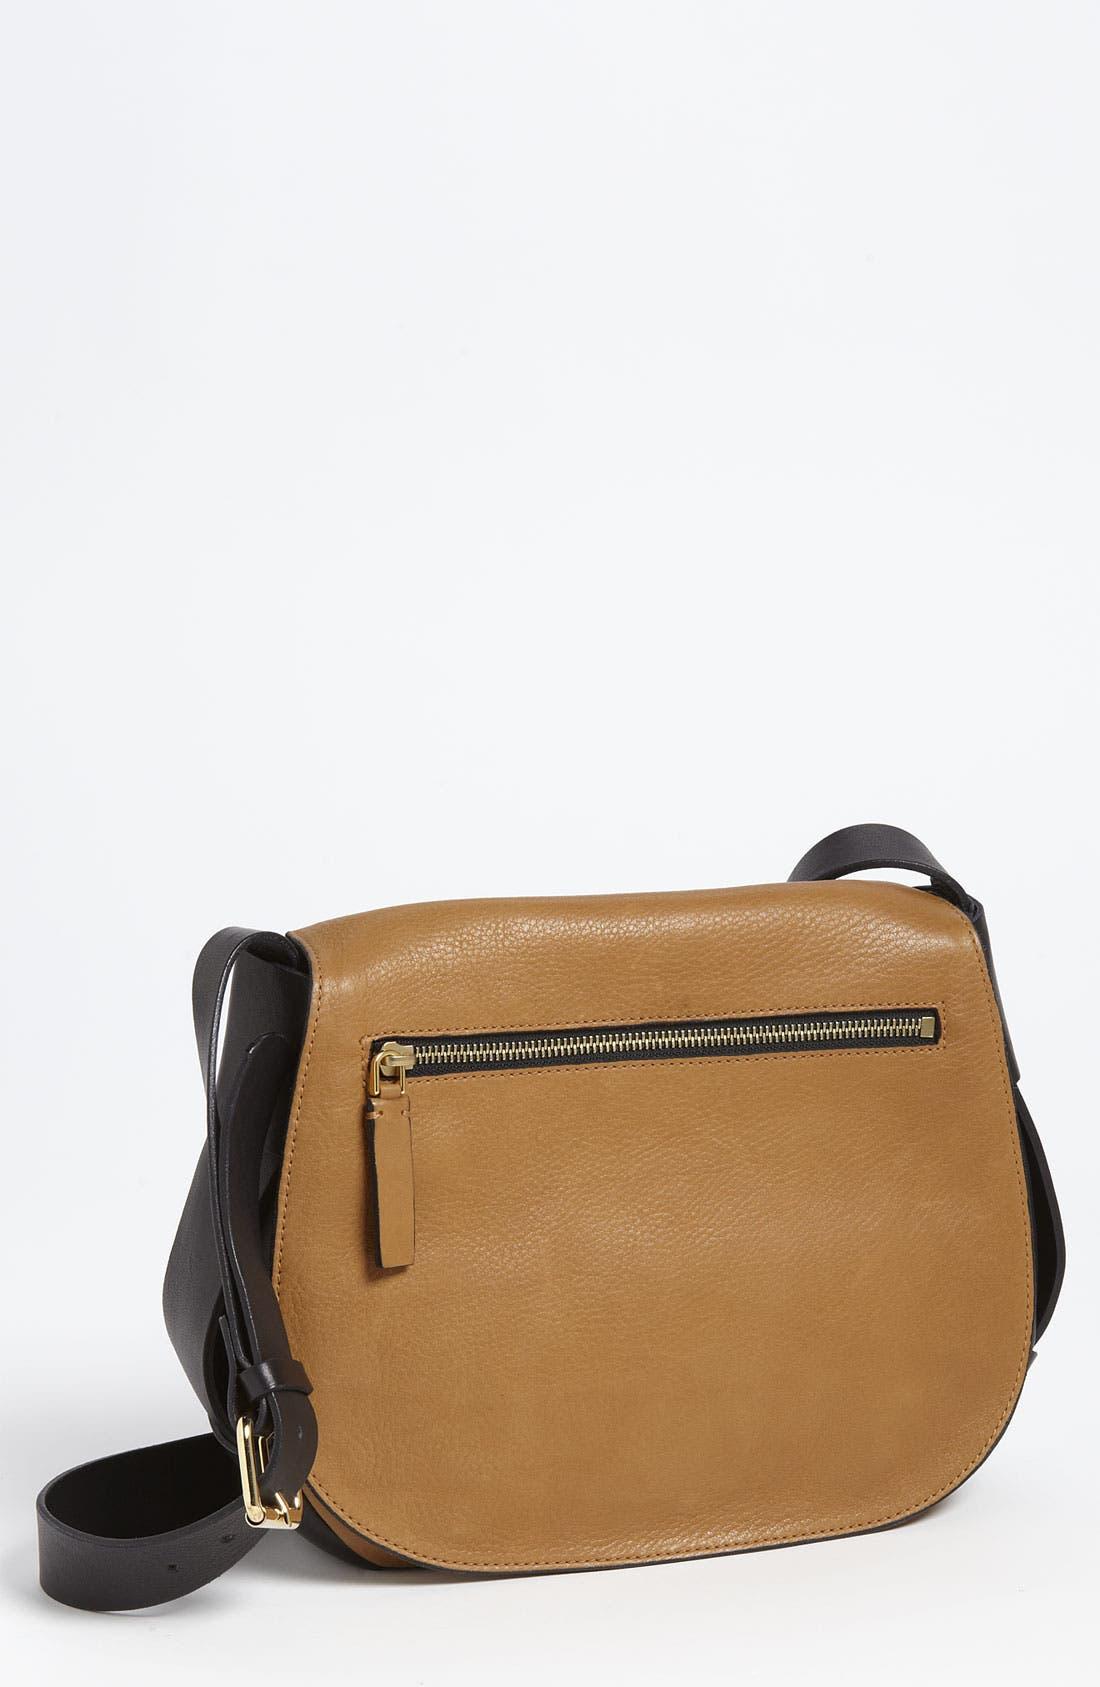 Alternate Image 1 Selected - Marni 'Small' Bicolor Crossbody Bag